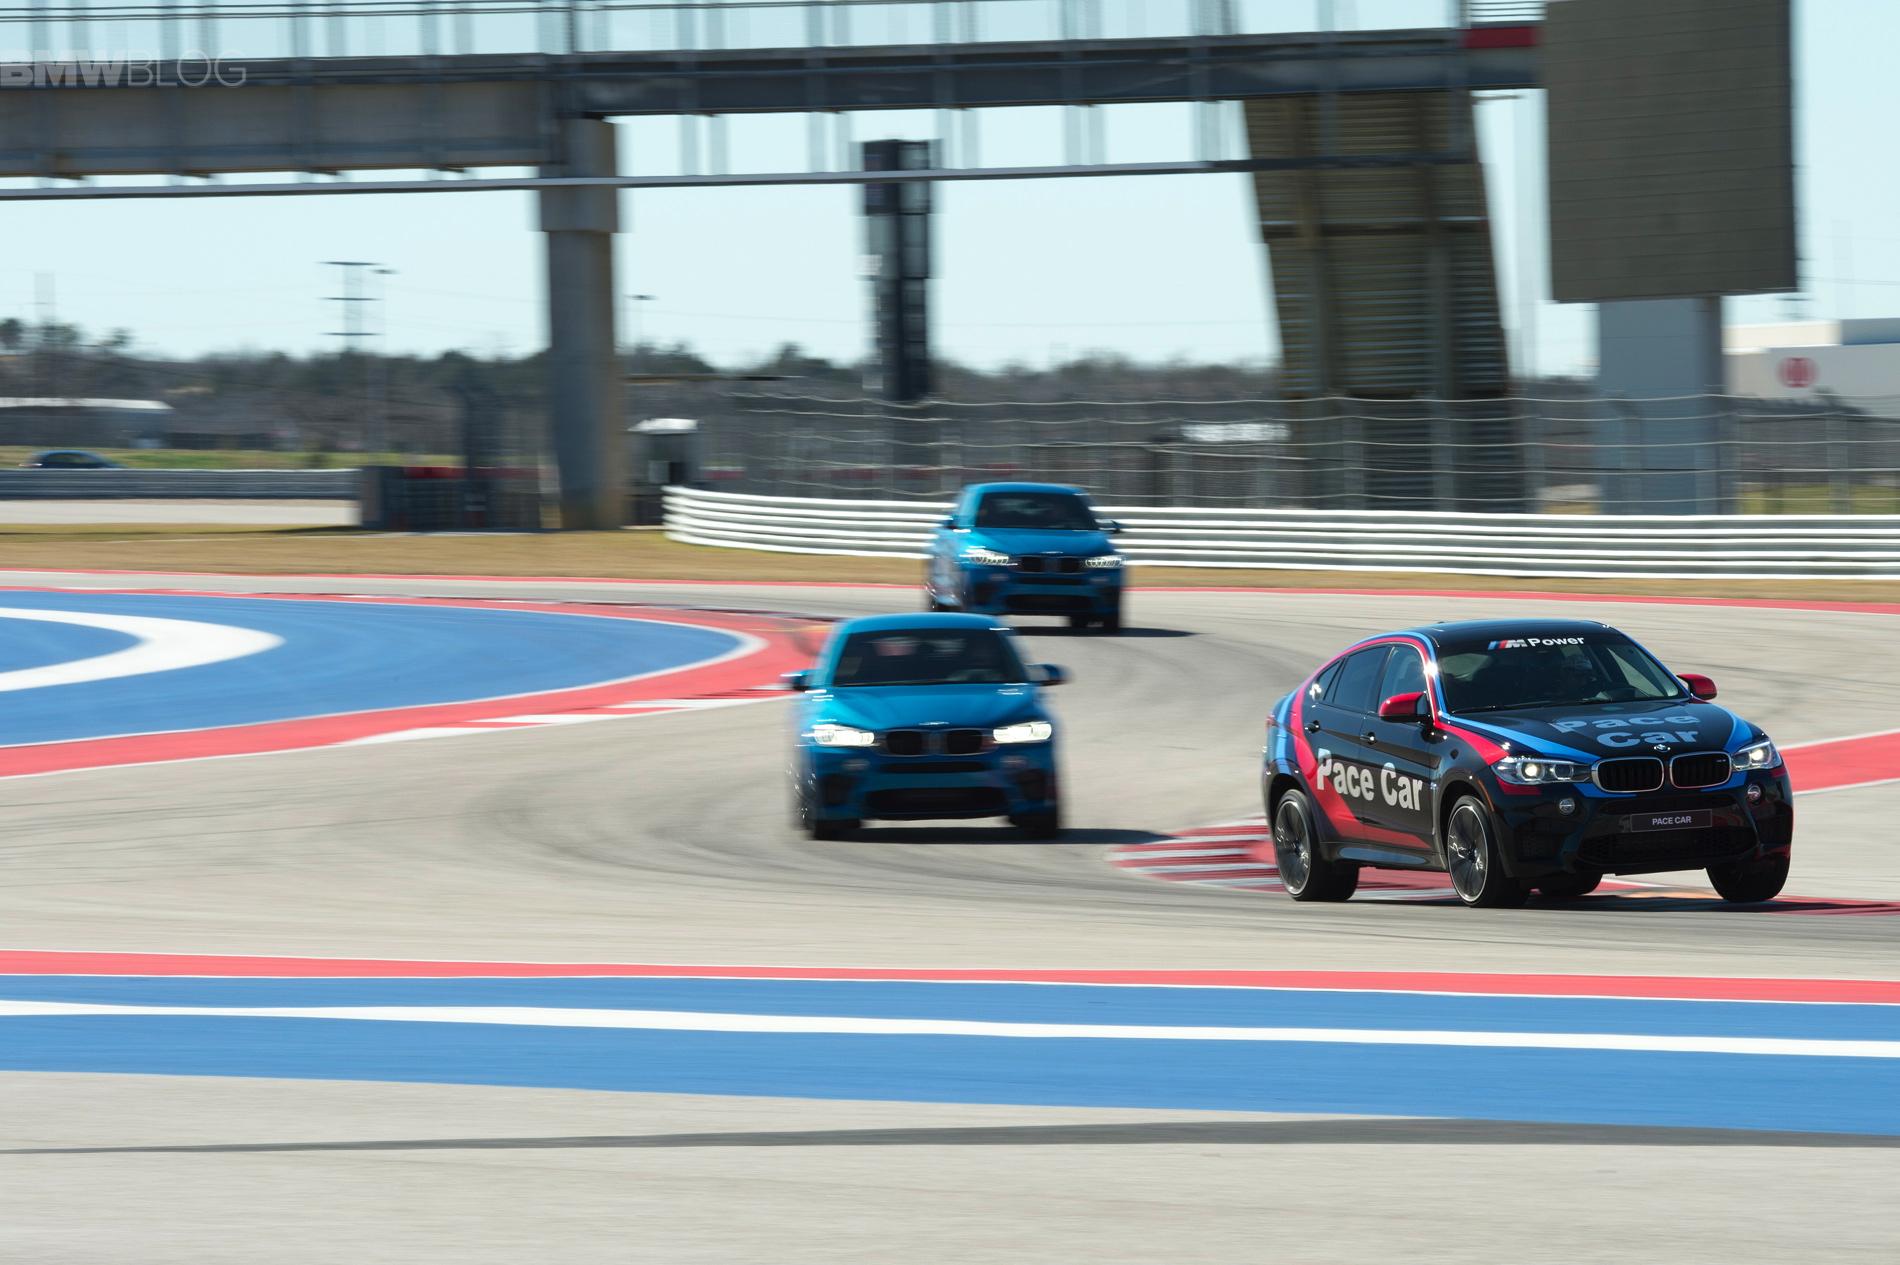 2015 bmw x6 m race track images 14